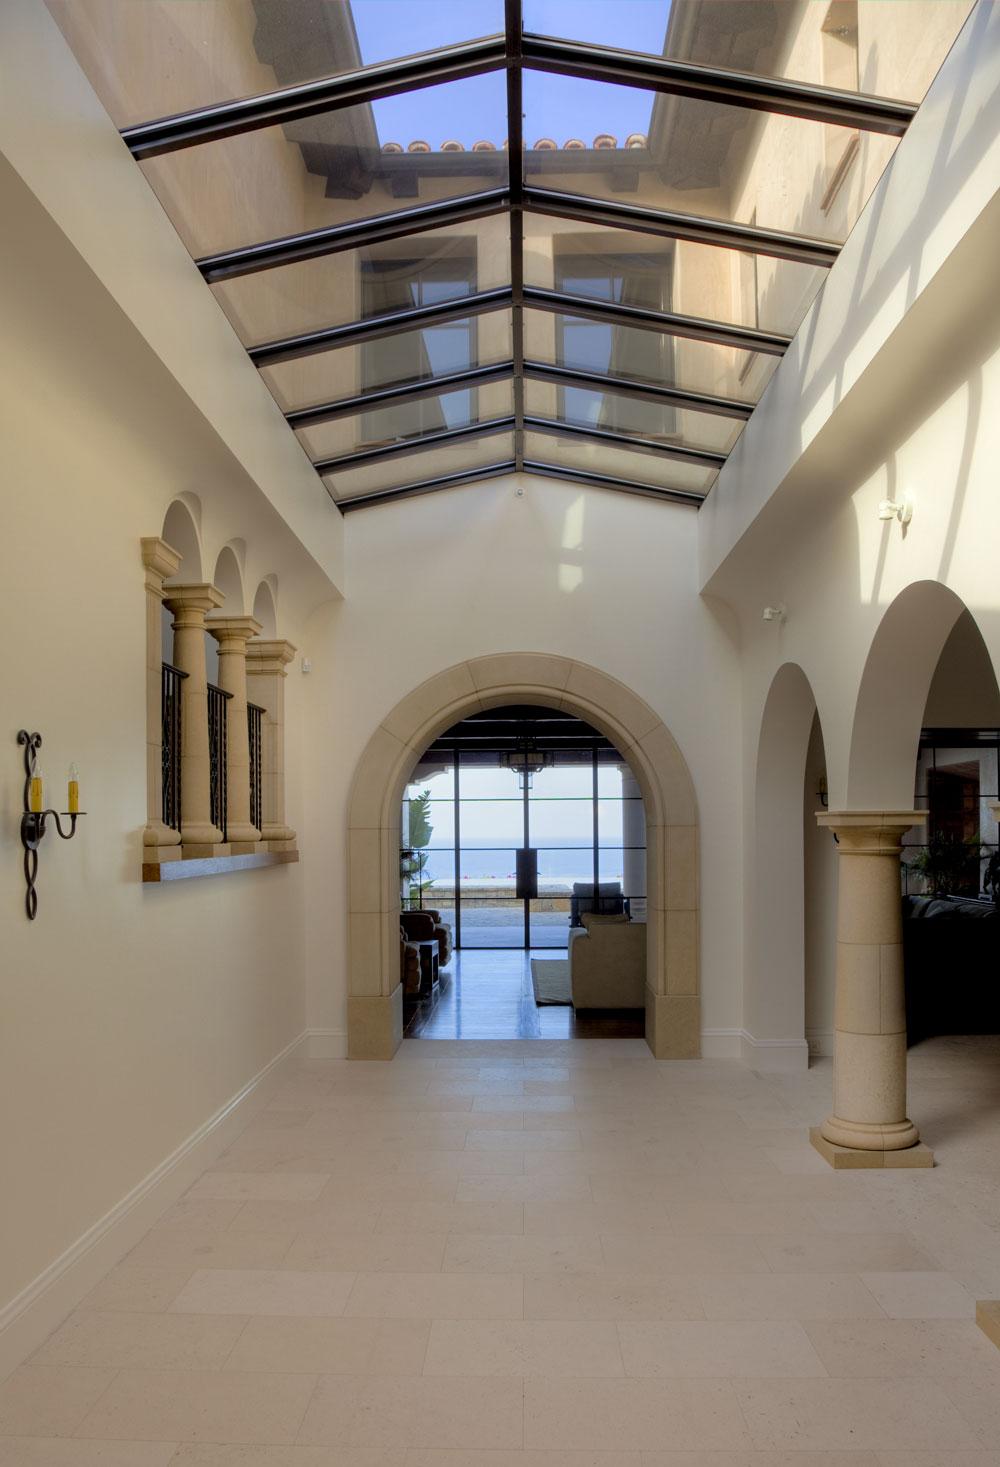 Modern-Spanish-Glass-Ceiling-Minimalist-Hallway-Stone-Archway-Corbin-Reeves.jpg